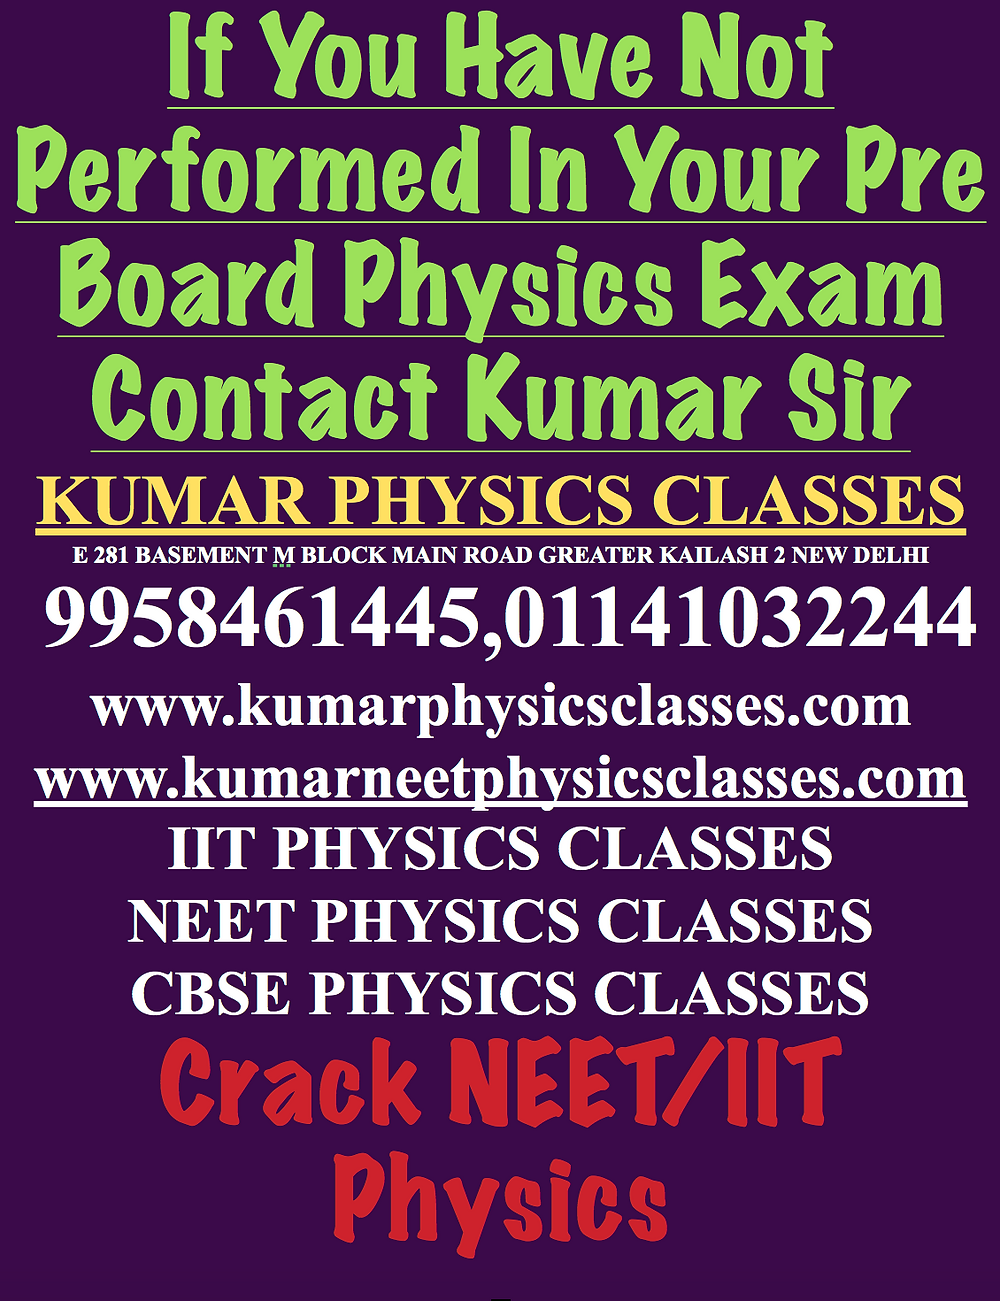 If You Have Not Performed In Your Pre Board Physics Exam Contact Kumar Sir KUMAR PHYSICS CLASSES E 281 BASEMENT M BLOCK MAIN ROAD GREATER KAILASH 2 NEW DELHI  9958461445,01141032244 www.kumarphysicsclasses.com www.kumarneetphysicsclasses.com IIT PHYSICS CLASSES NEET PHYSICS CLASSES CBSE PHYSICS CLASSES Crack NEET/IIT Physics